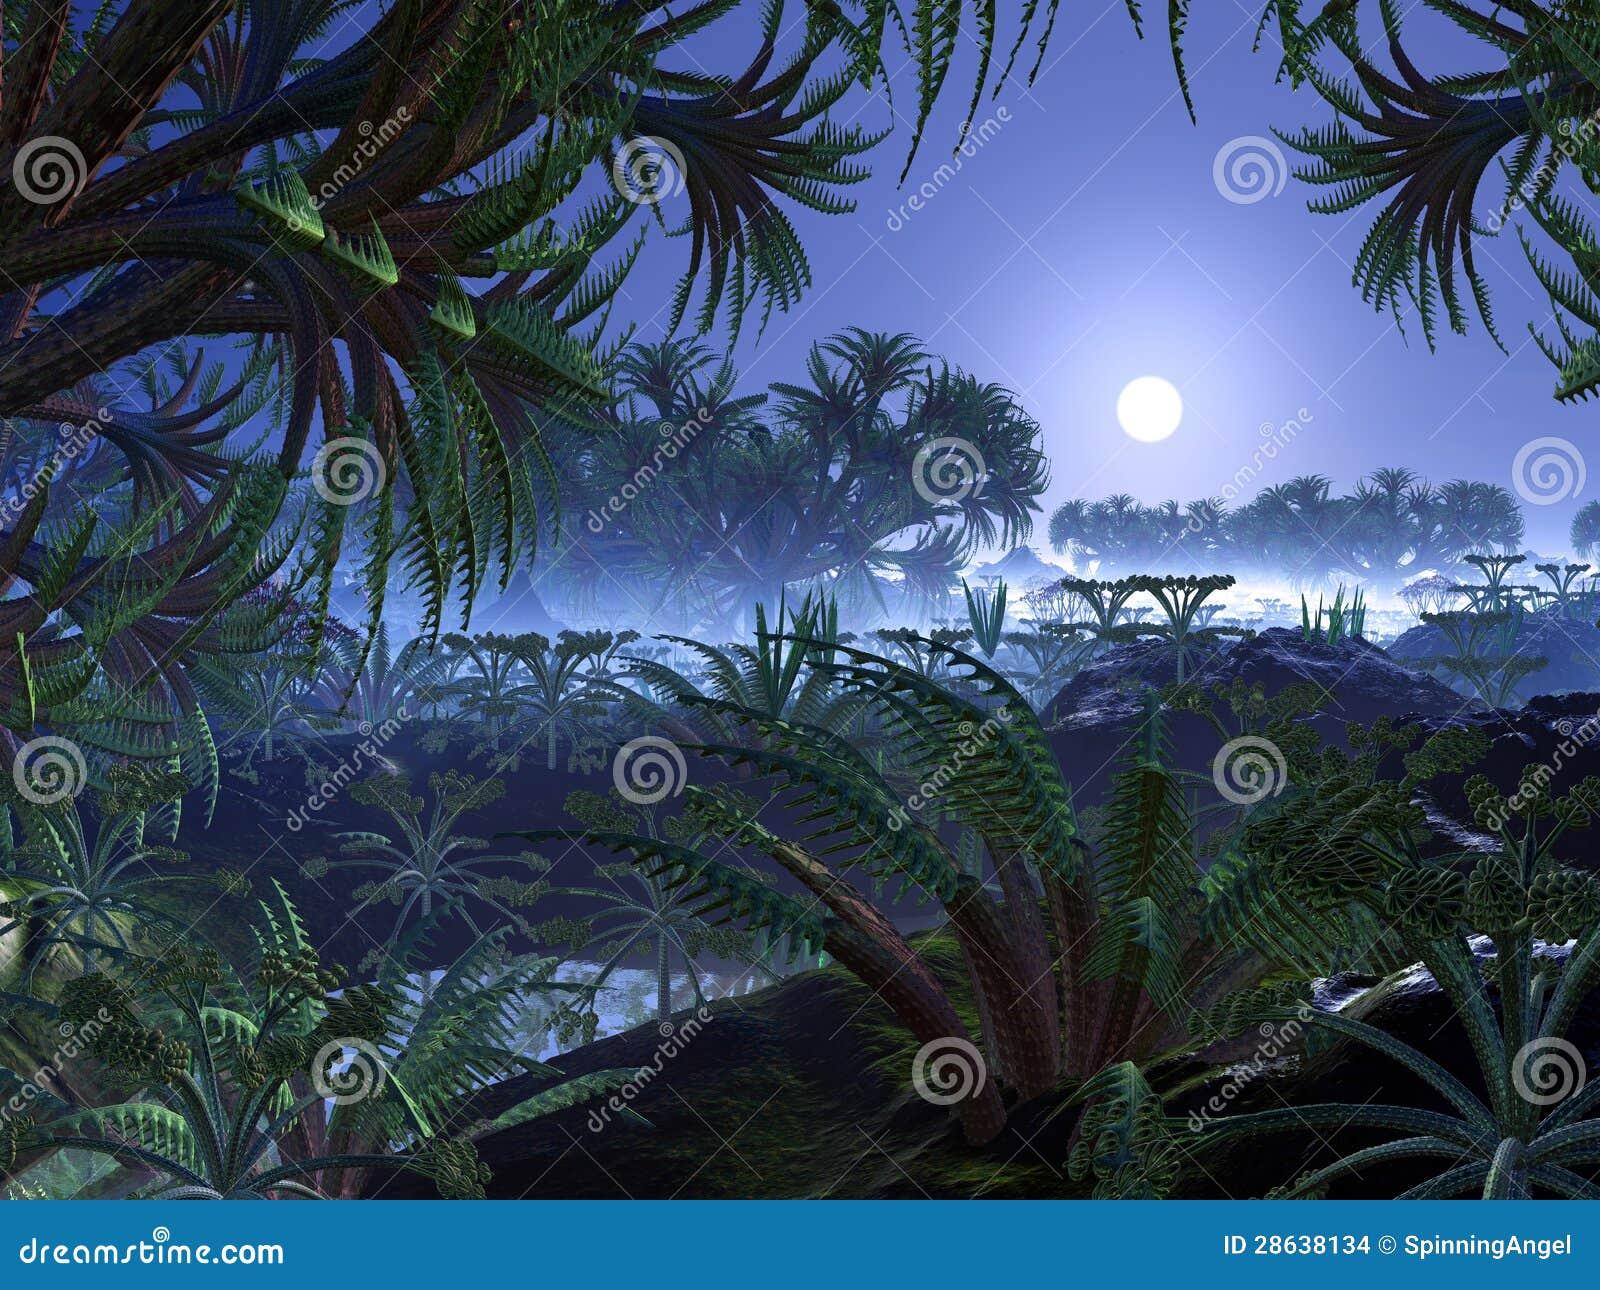 Alien Jungle World